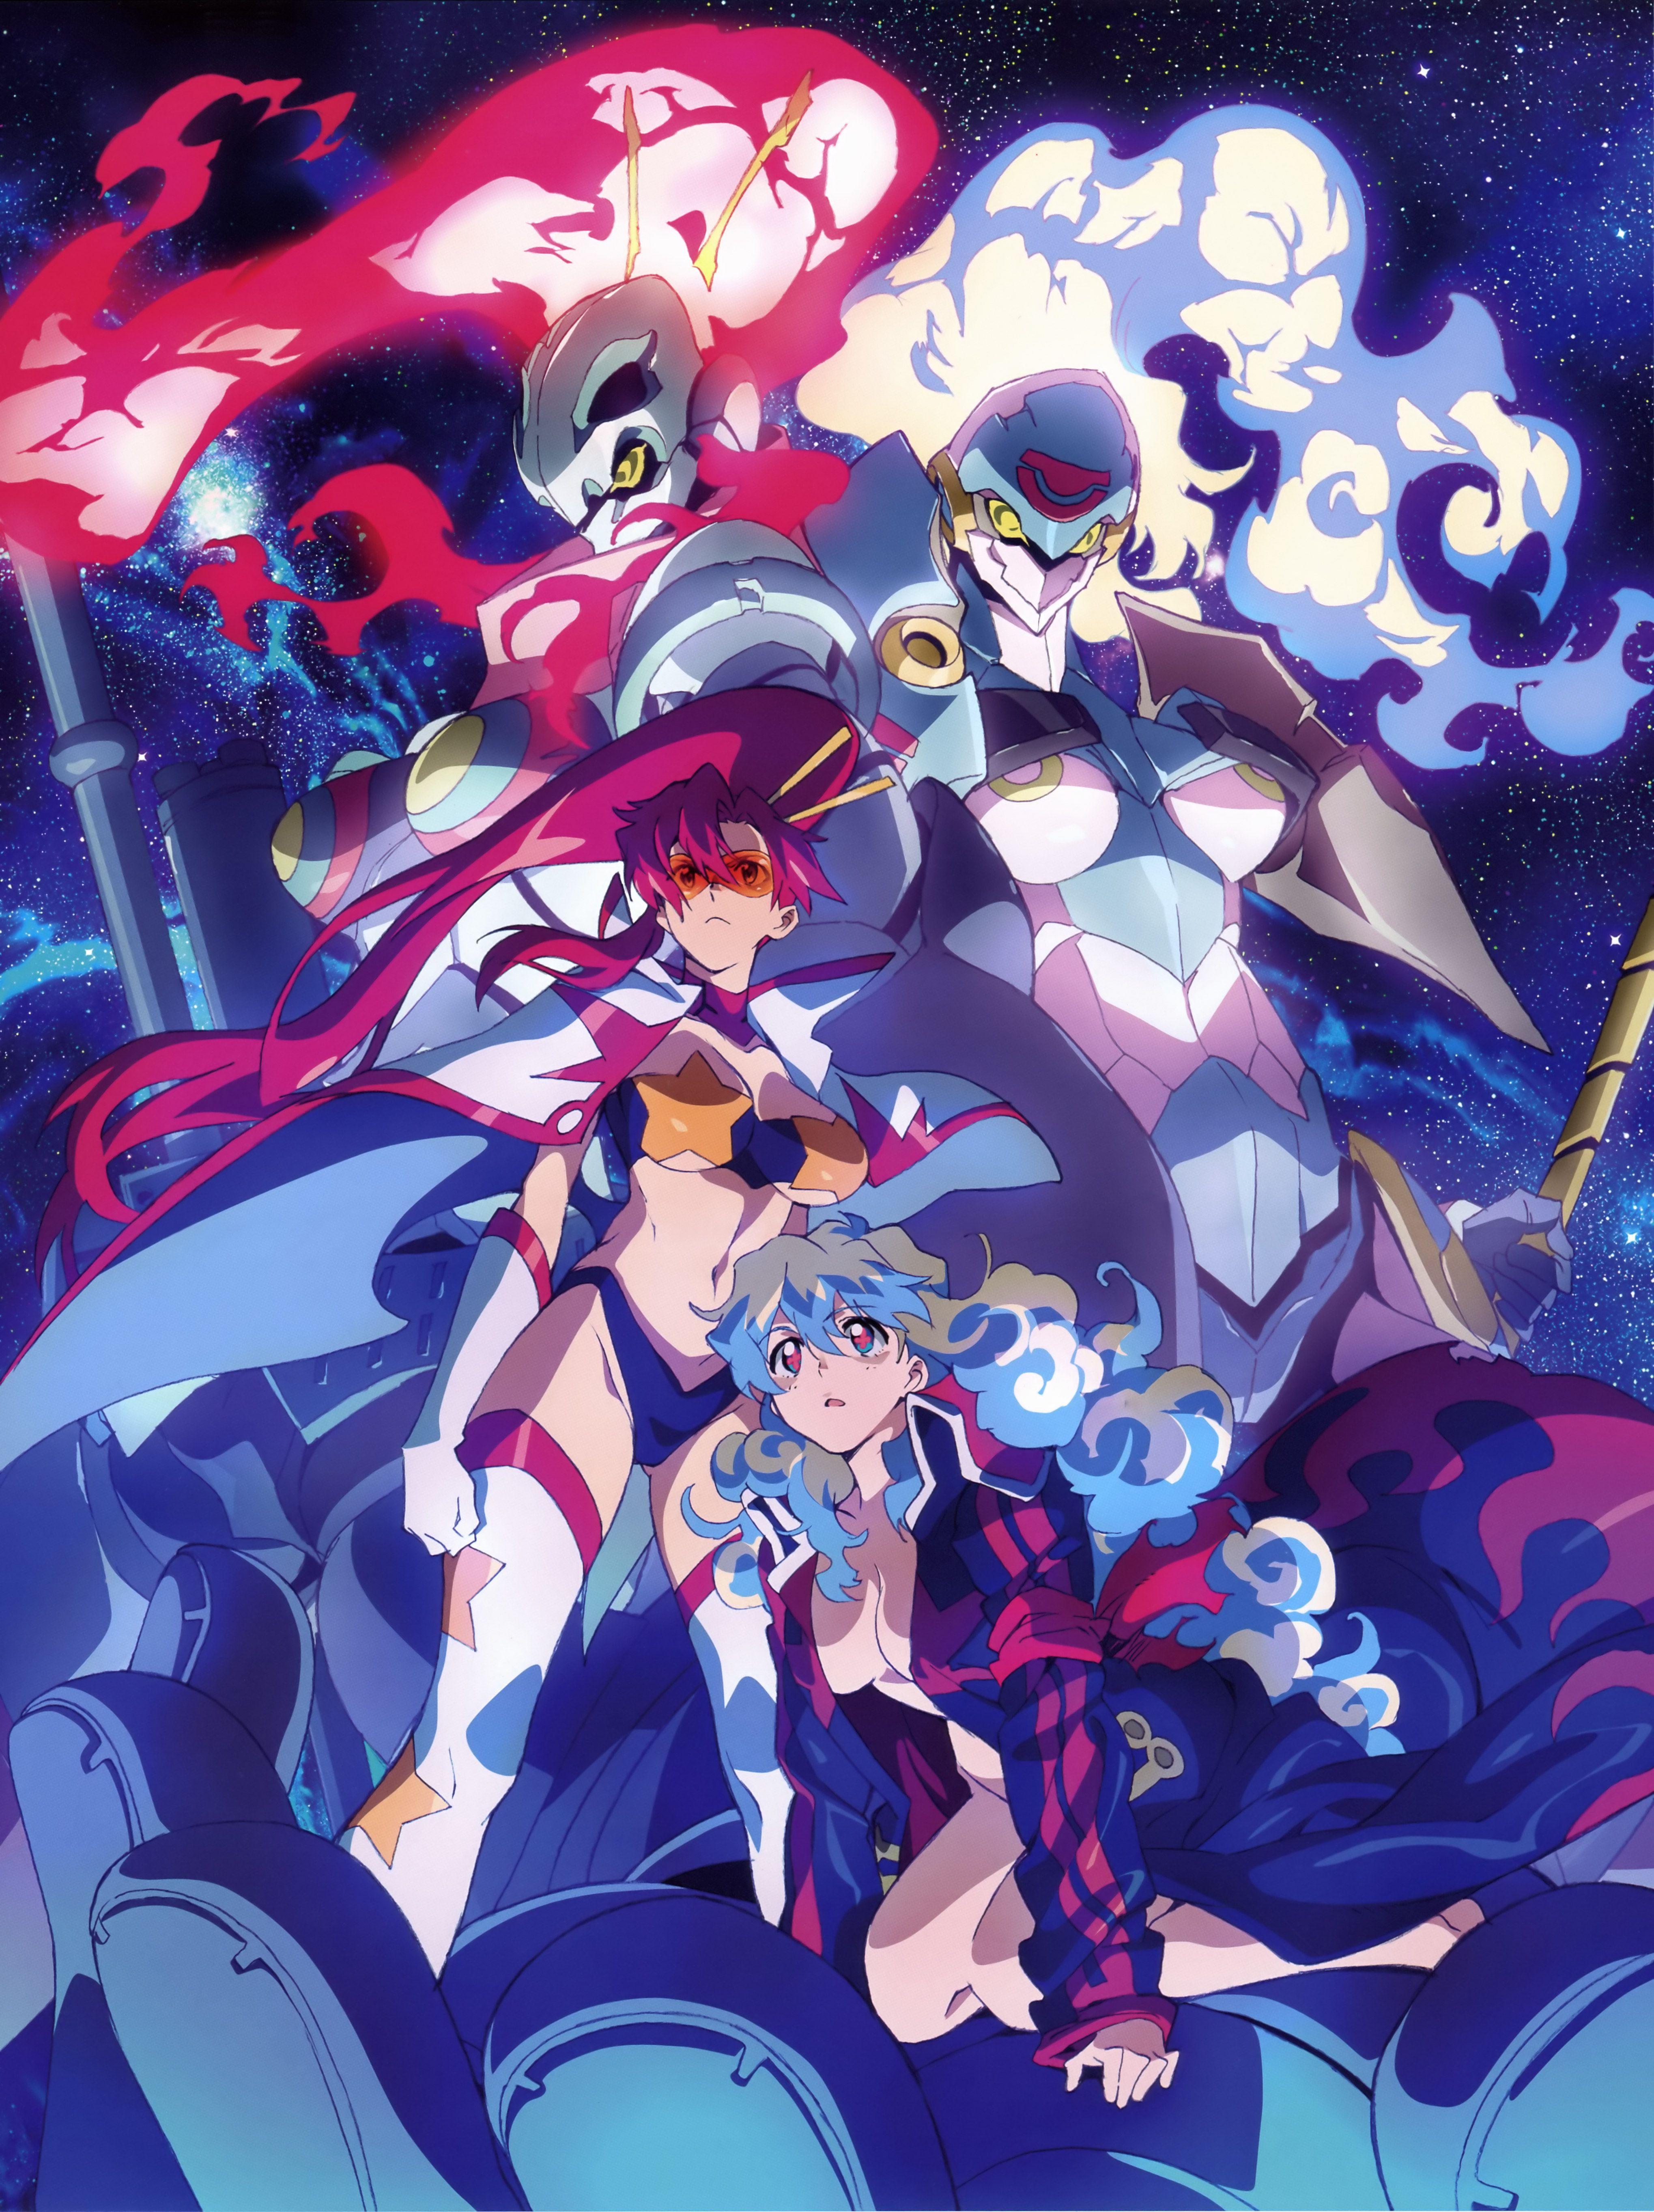 Tengen Toppa Gurren Lagann Anime HD Print Wall Poster Scroll Home Decor Cosplay